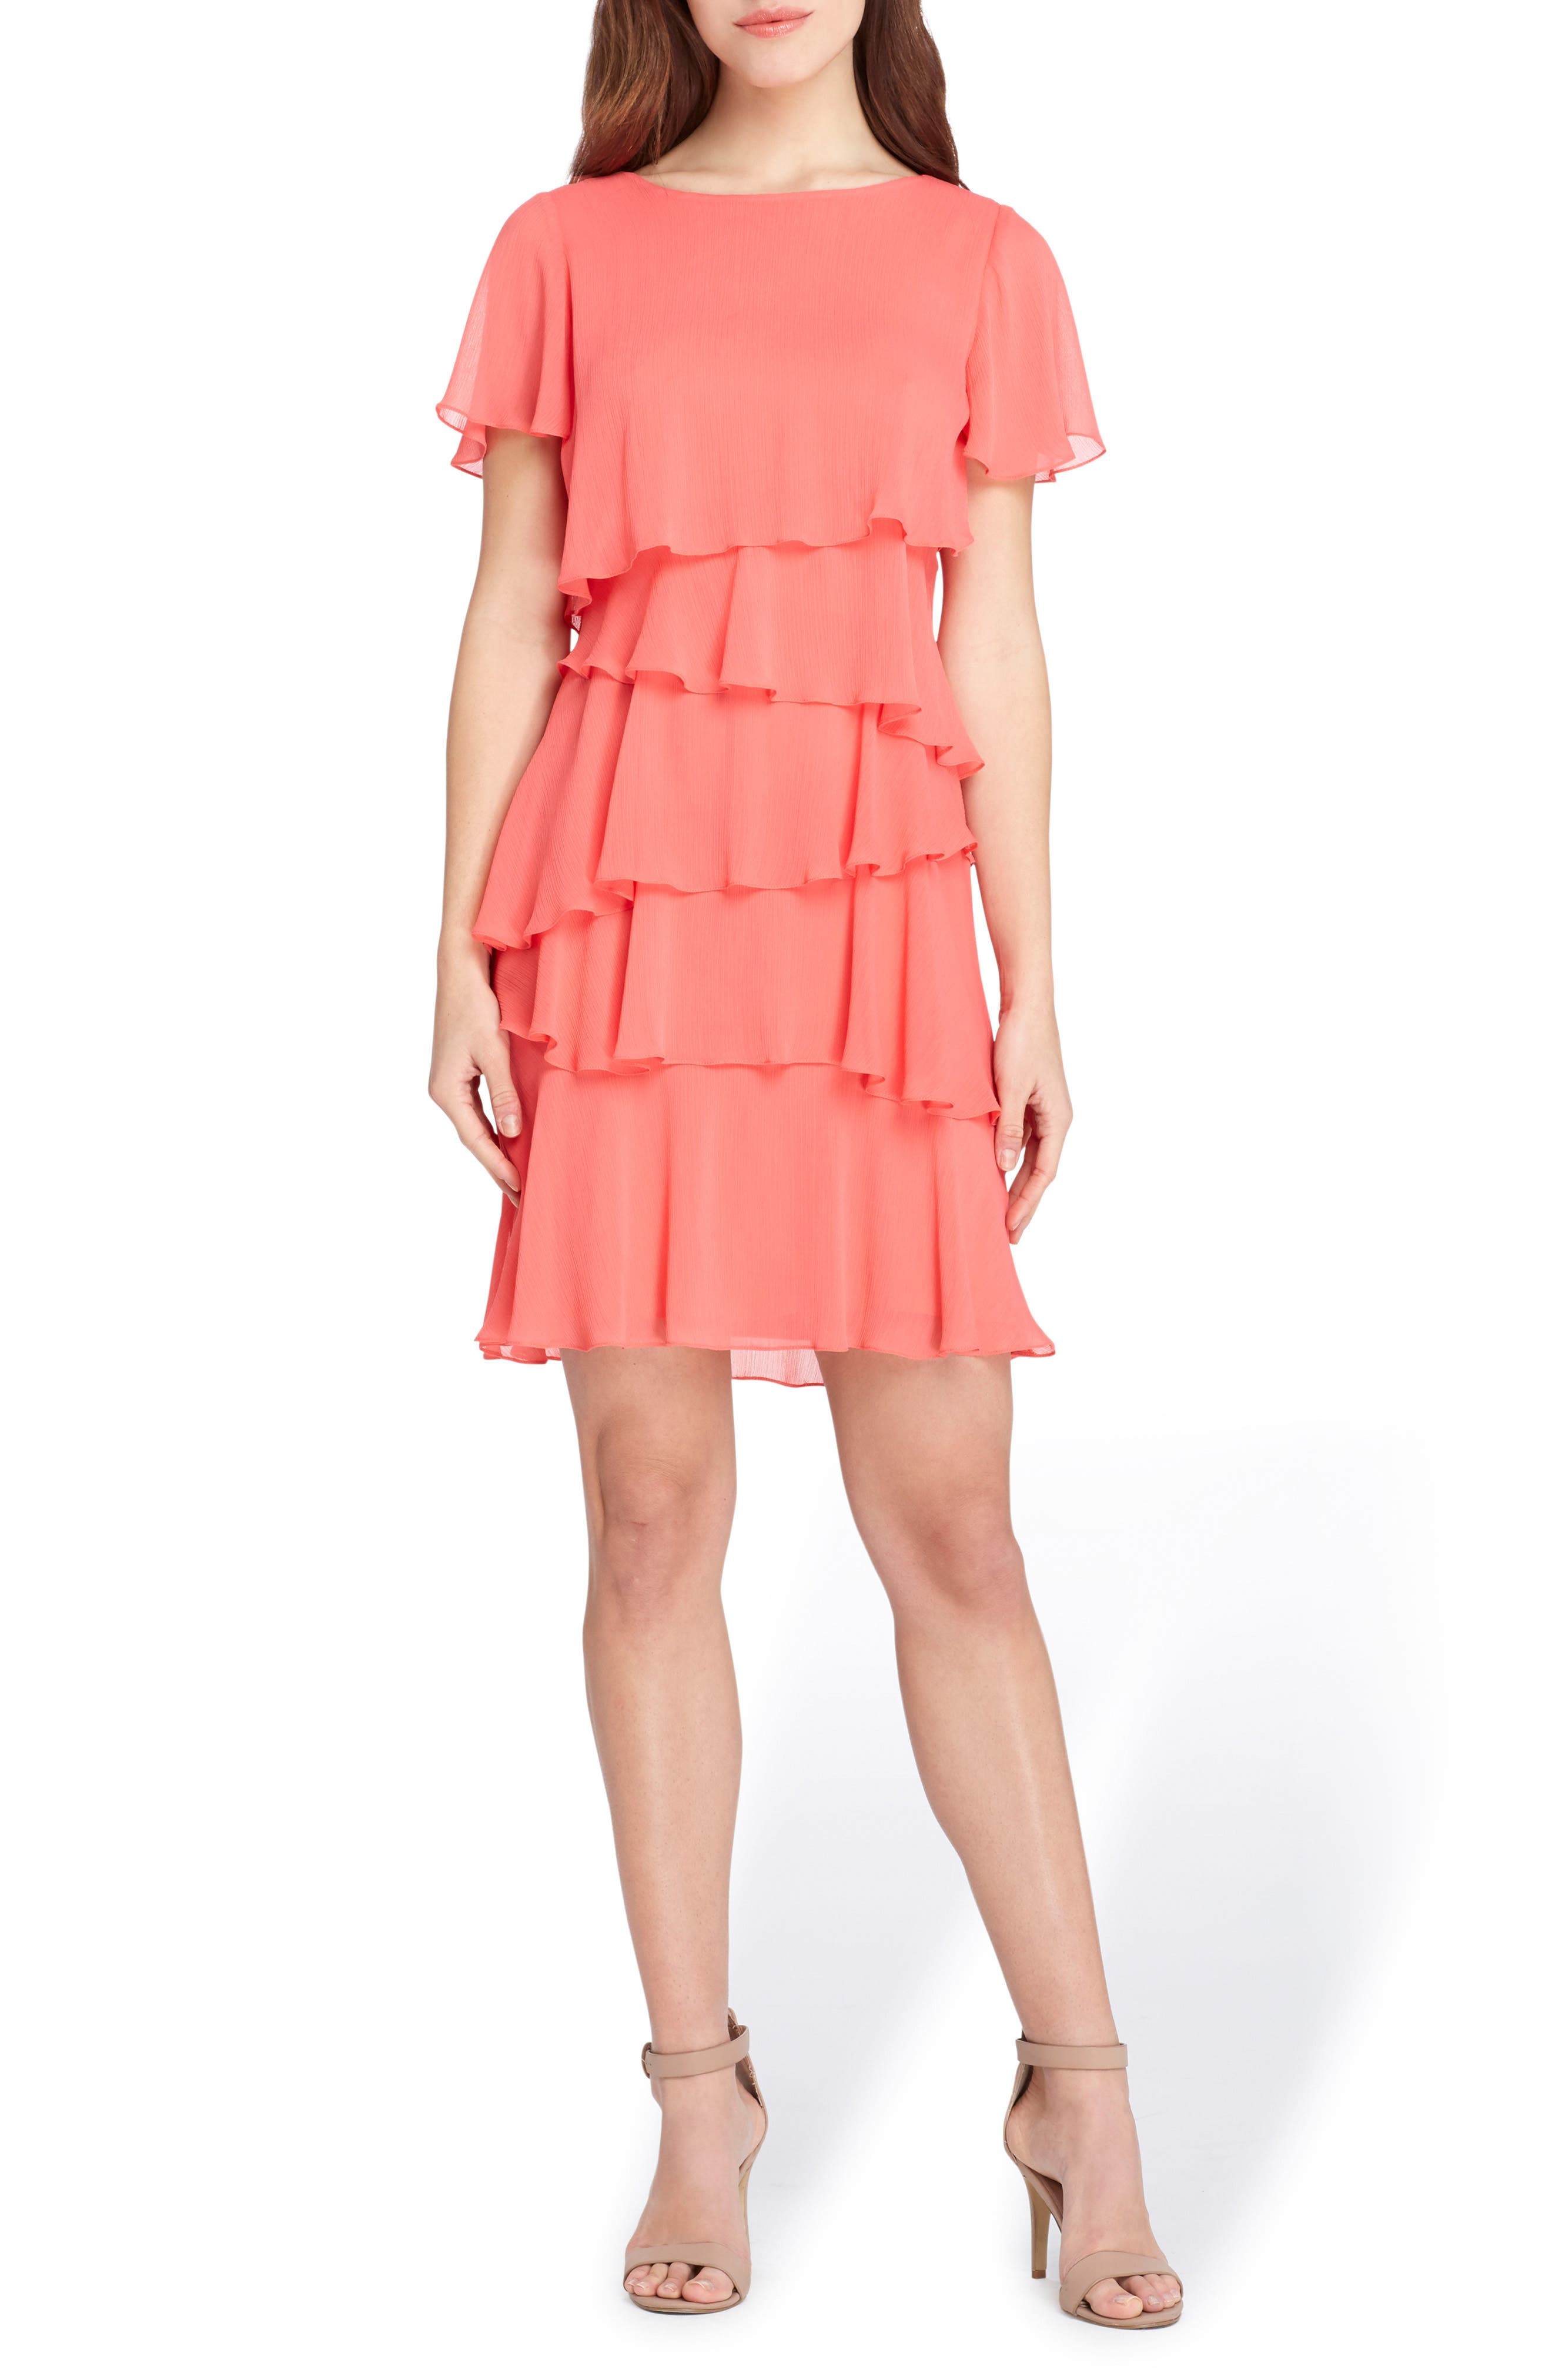 Yoryu Chiffon Ruffle Dress,                         Main,                         color, 959